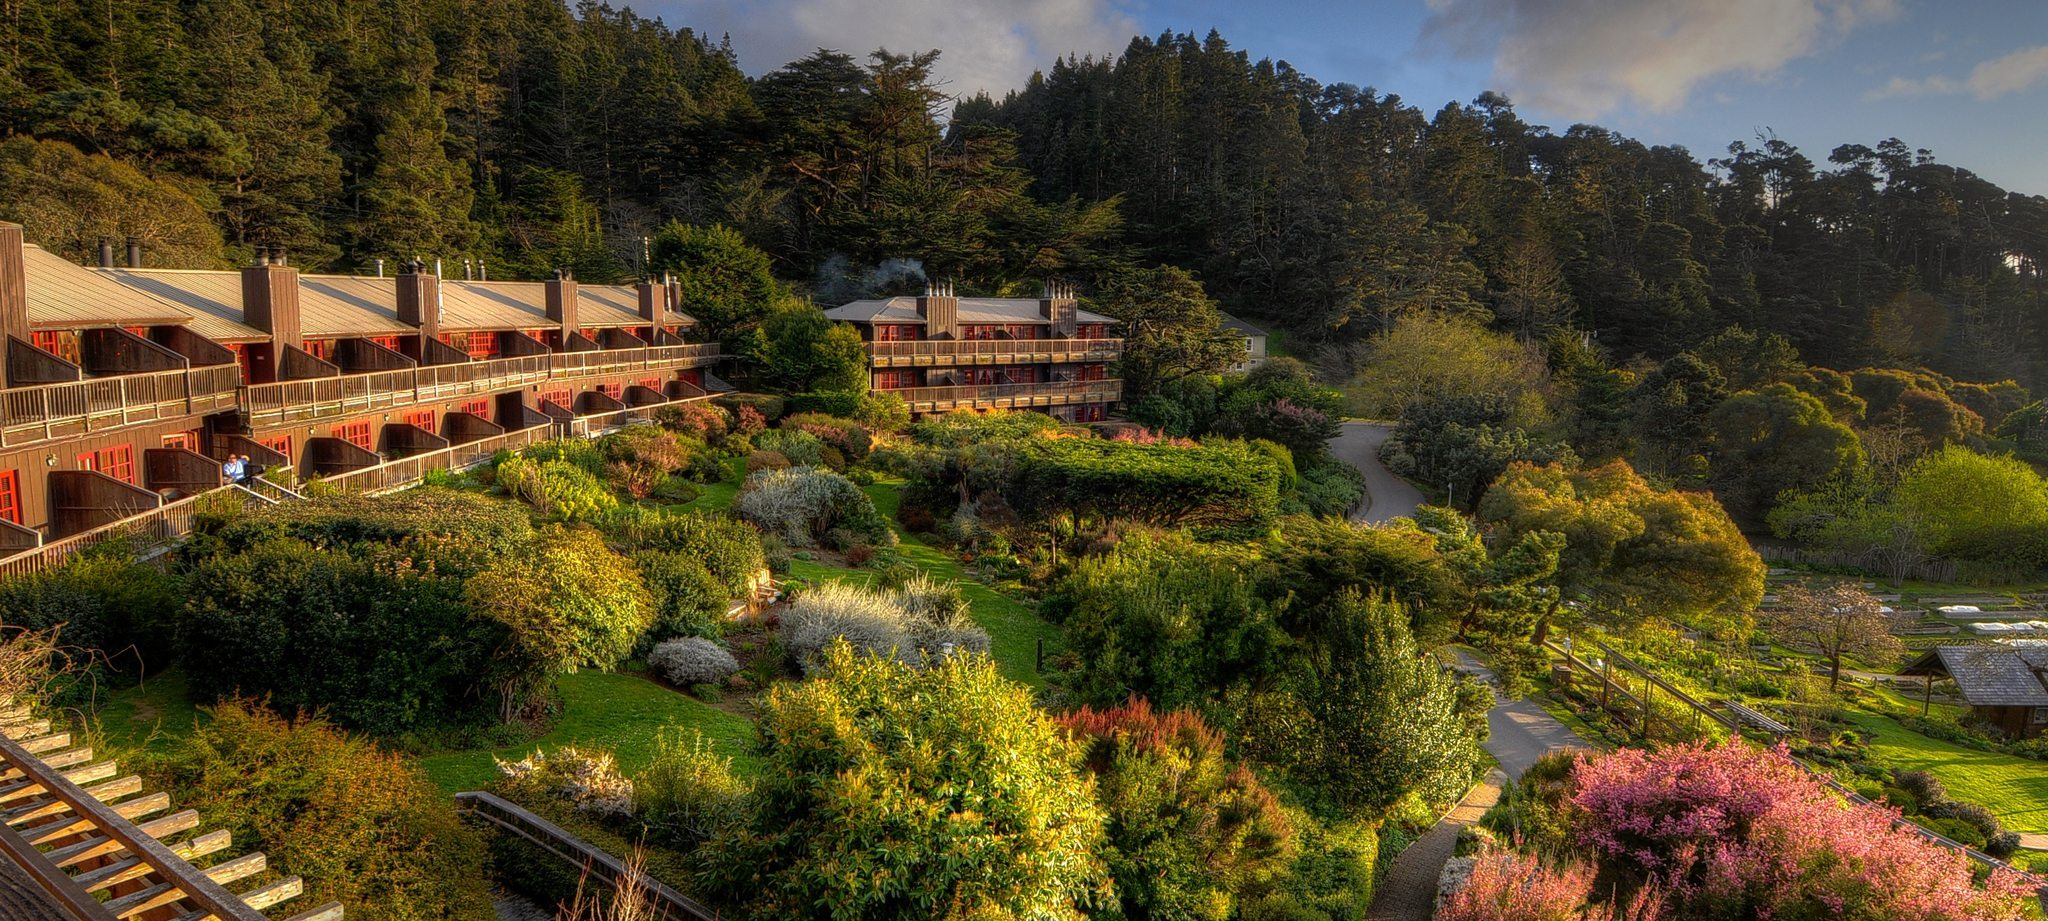 Plantbased Hotels